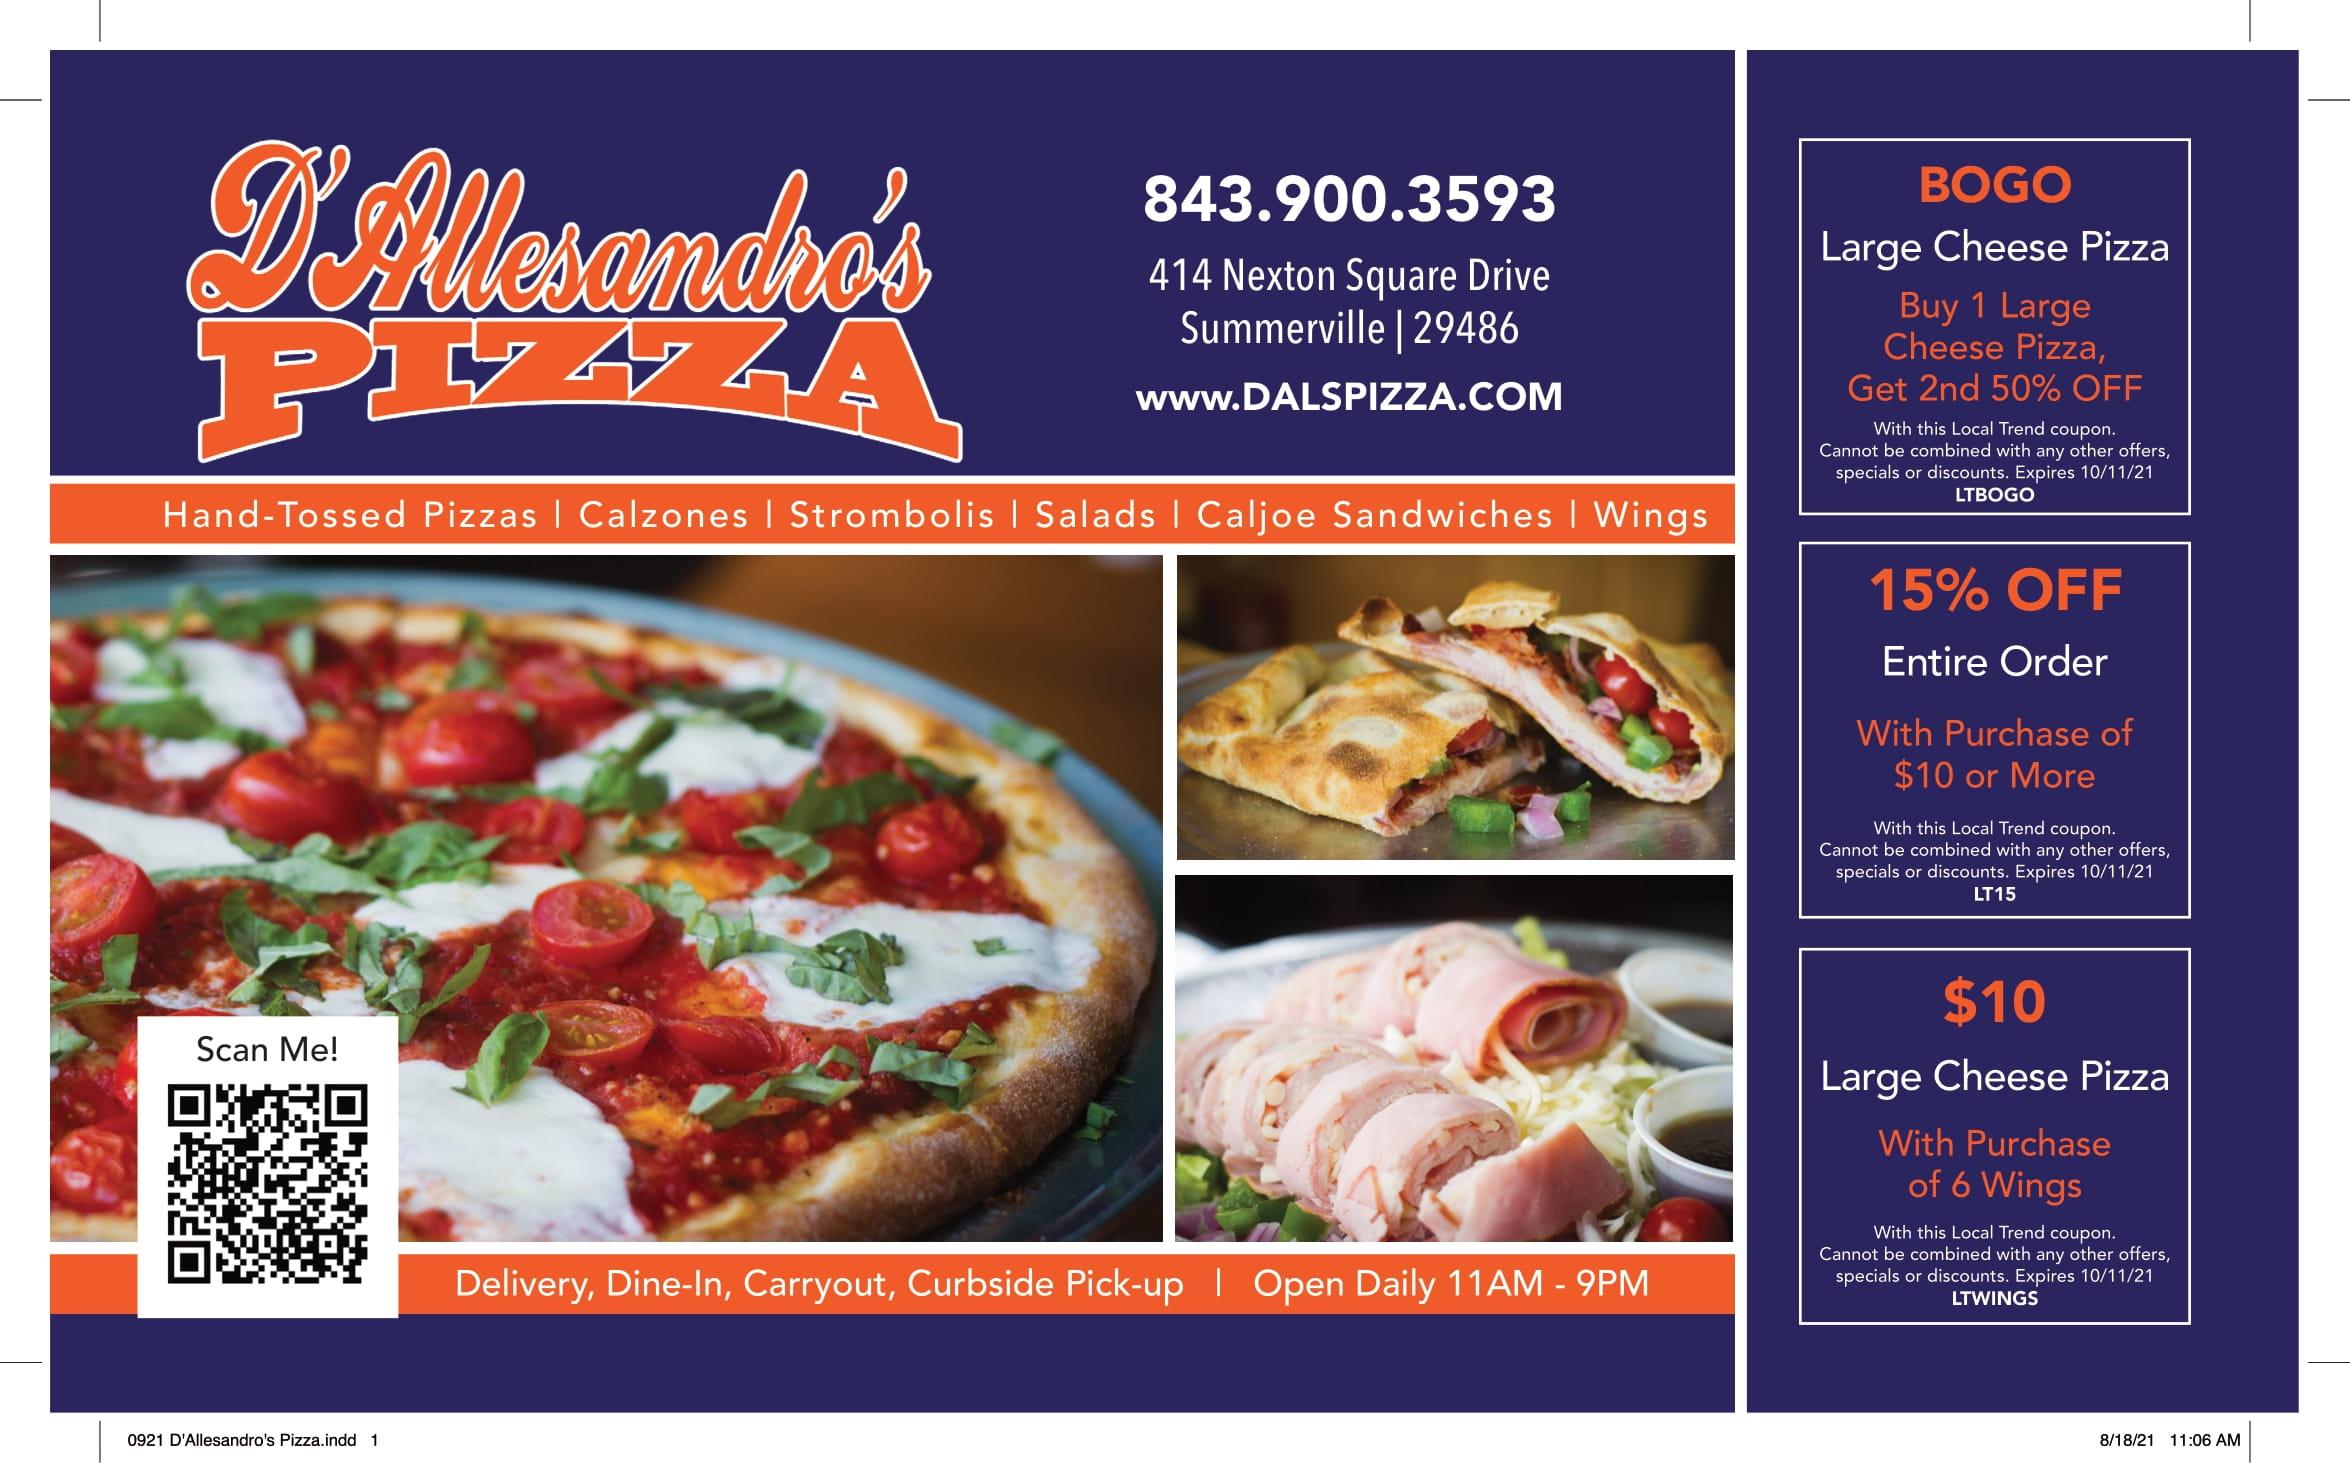 0921 DAllesandros Pizza 1